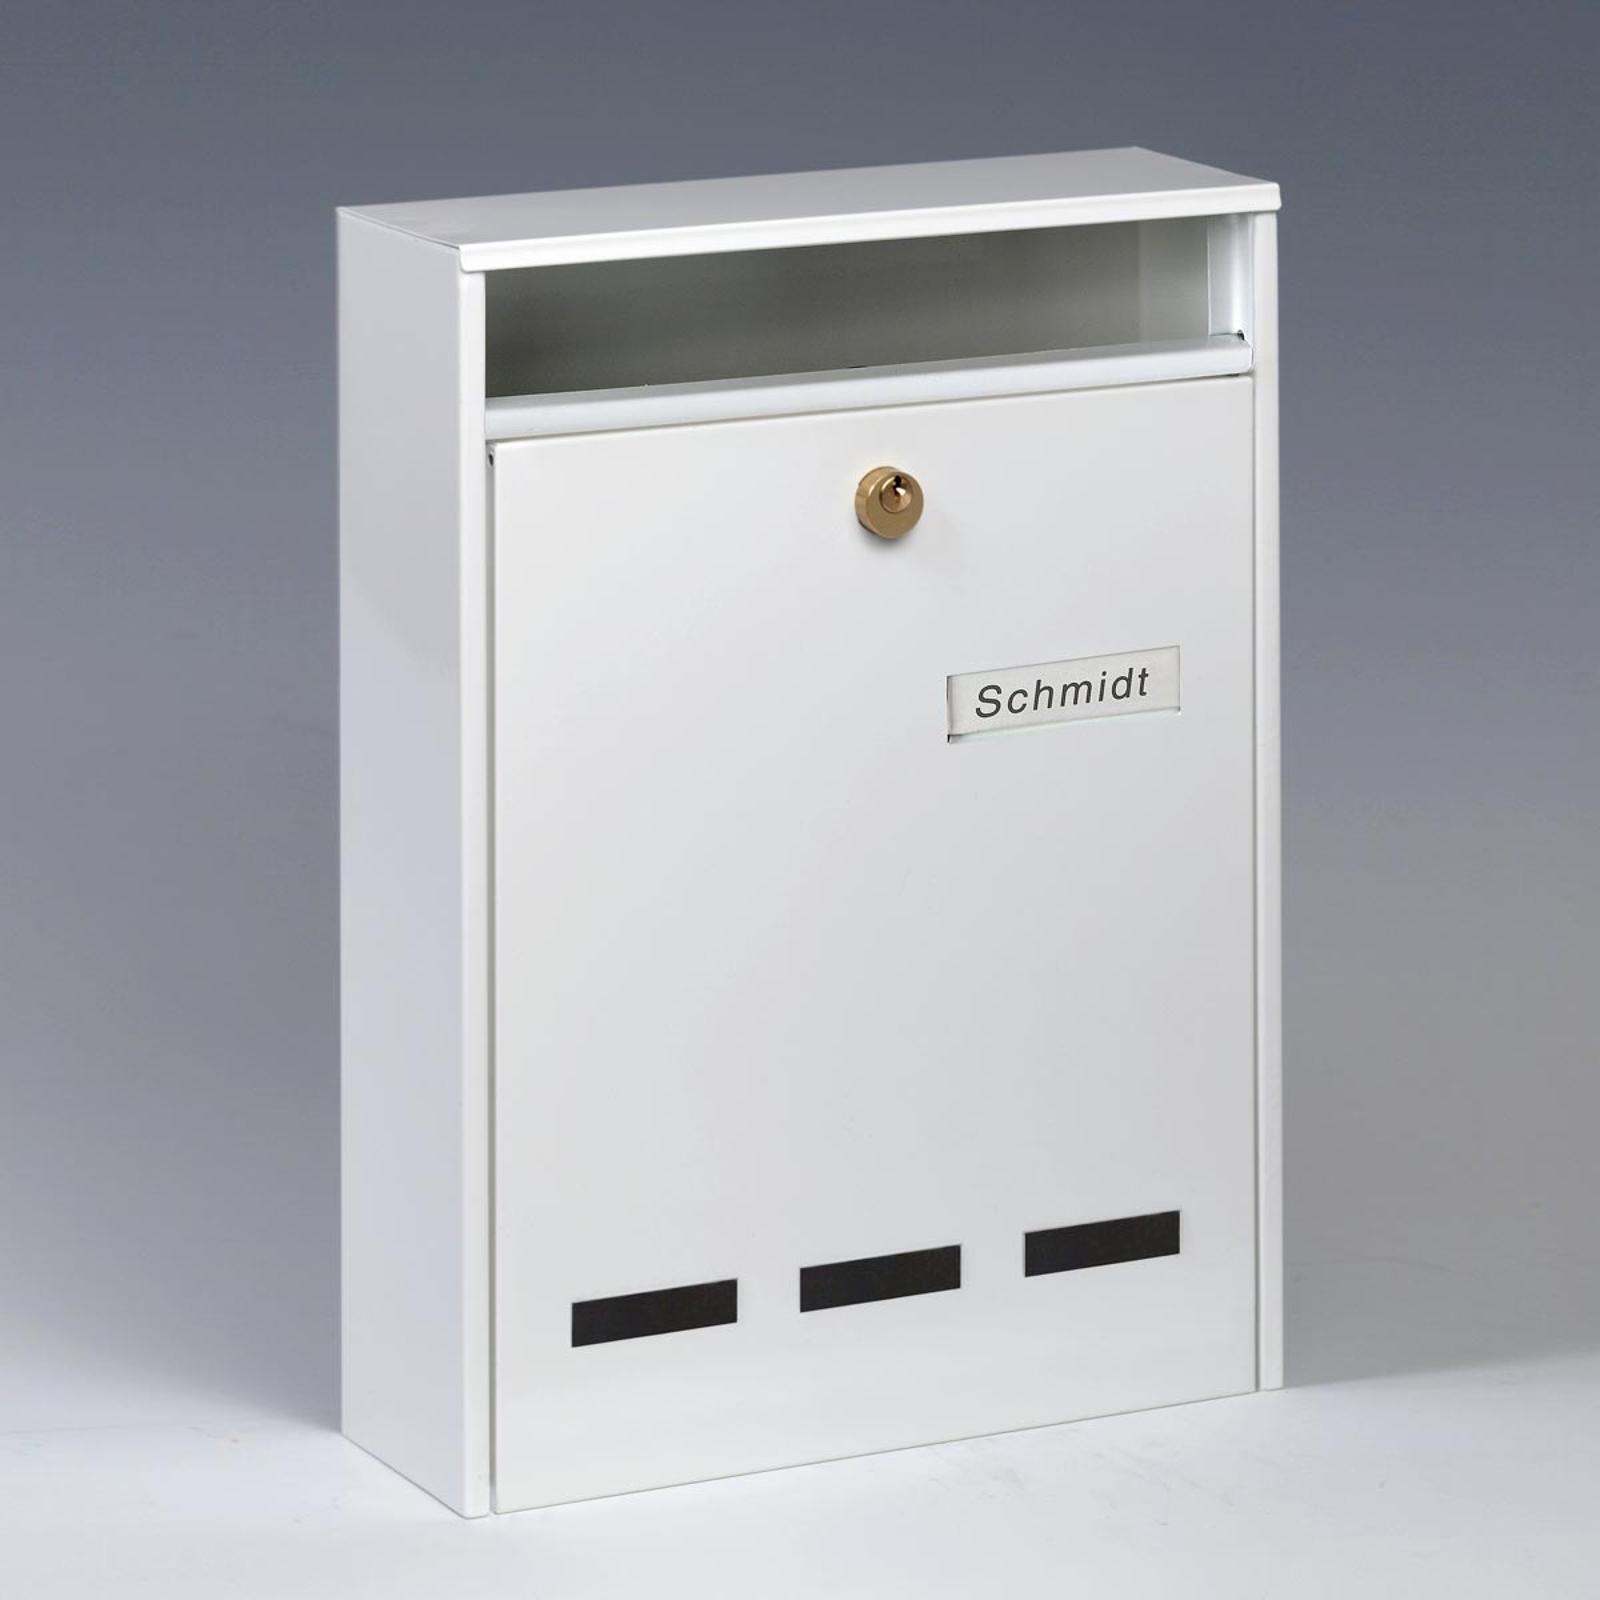 Anläggnings-brevlåda WISMAR DIN A4, vit